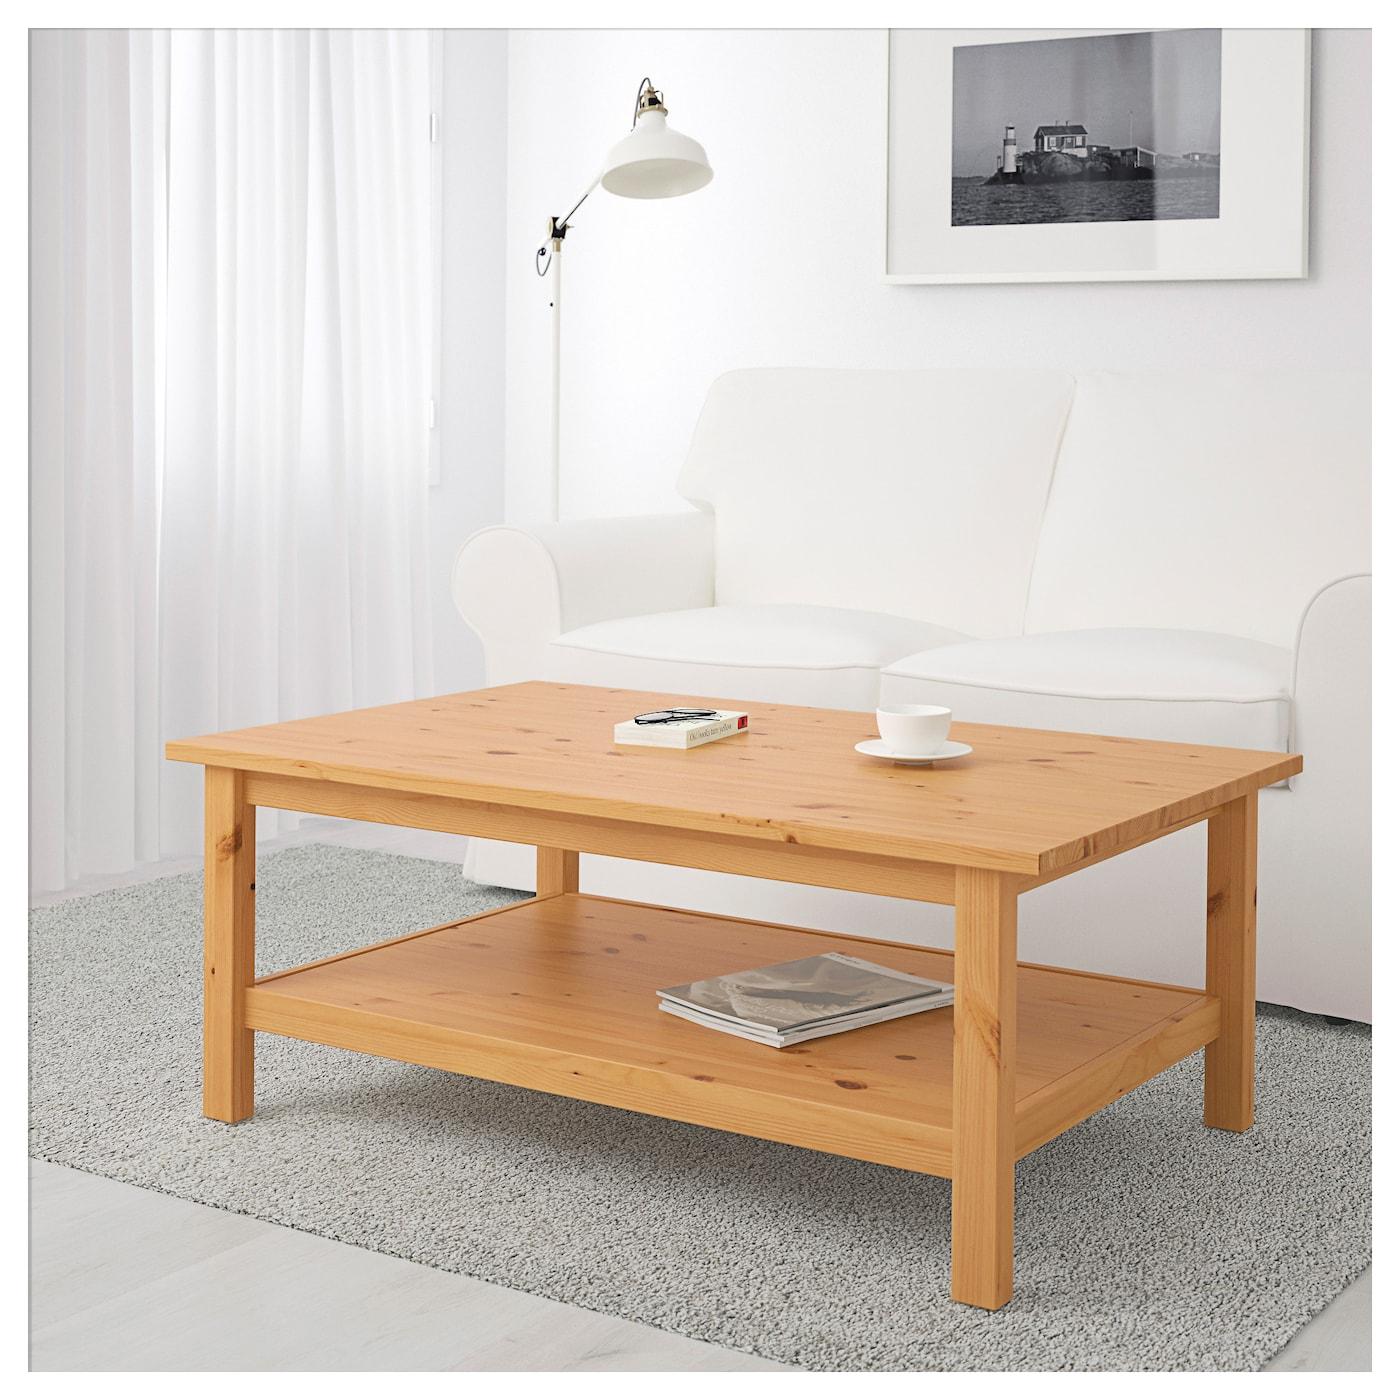 hemnes table basse brun clair 118 x 75 cm ikea. Black Bedroom Furniture Sets. Home Design Ideas